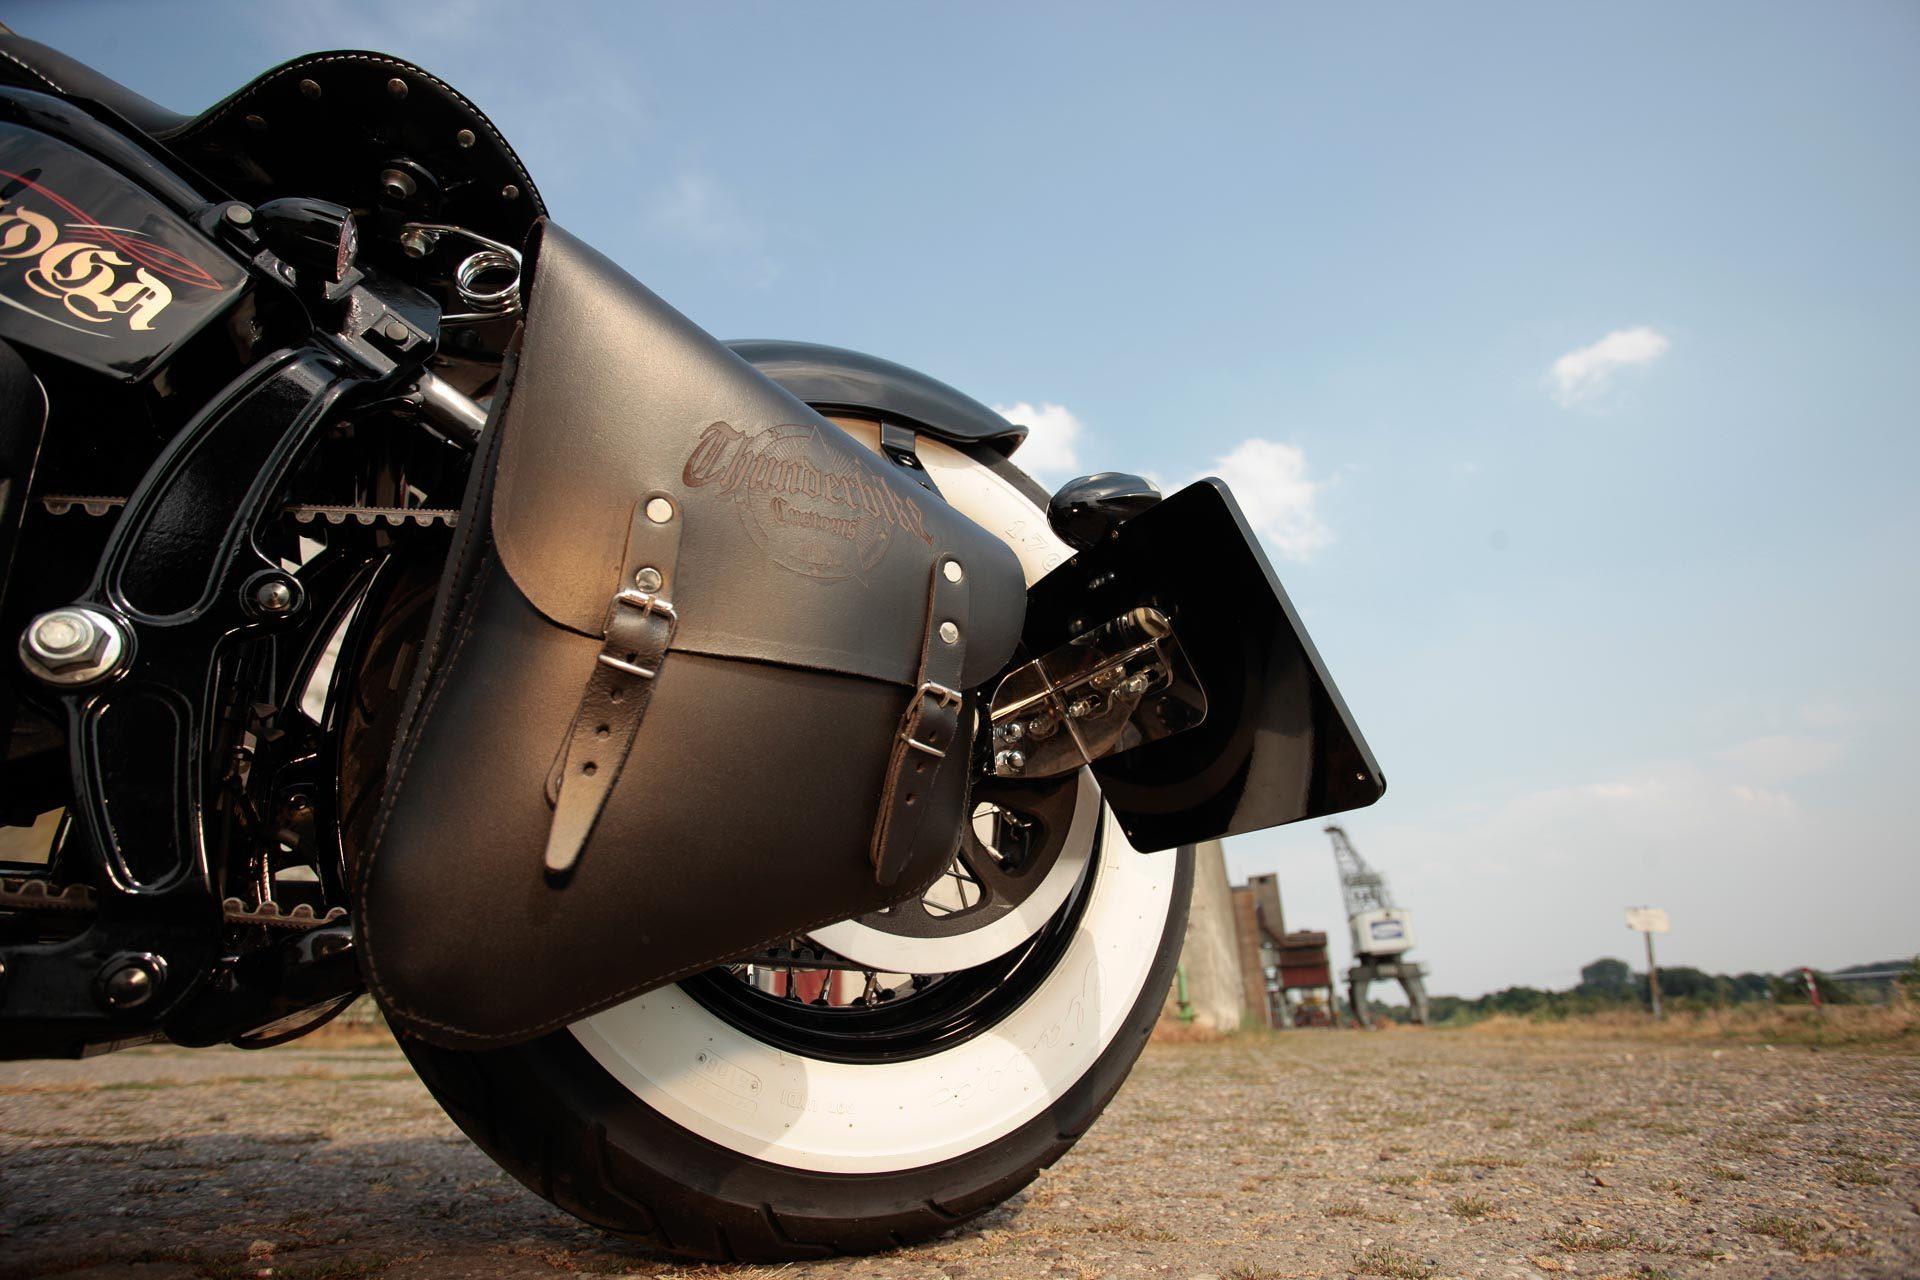 Thunderbike Pure Rodderz • H-D Cross Bones FLSTSB Softail Umbau